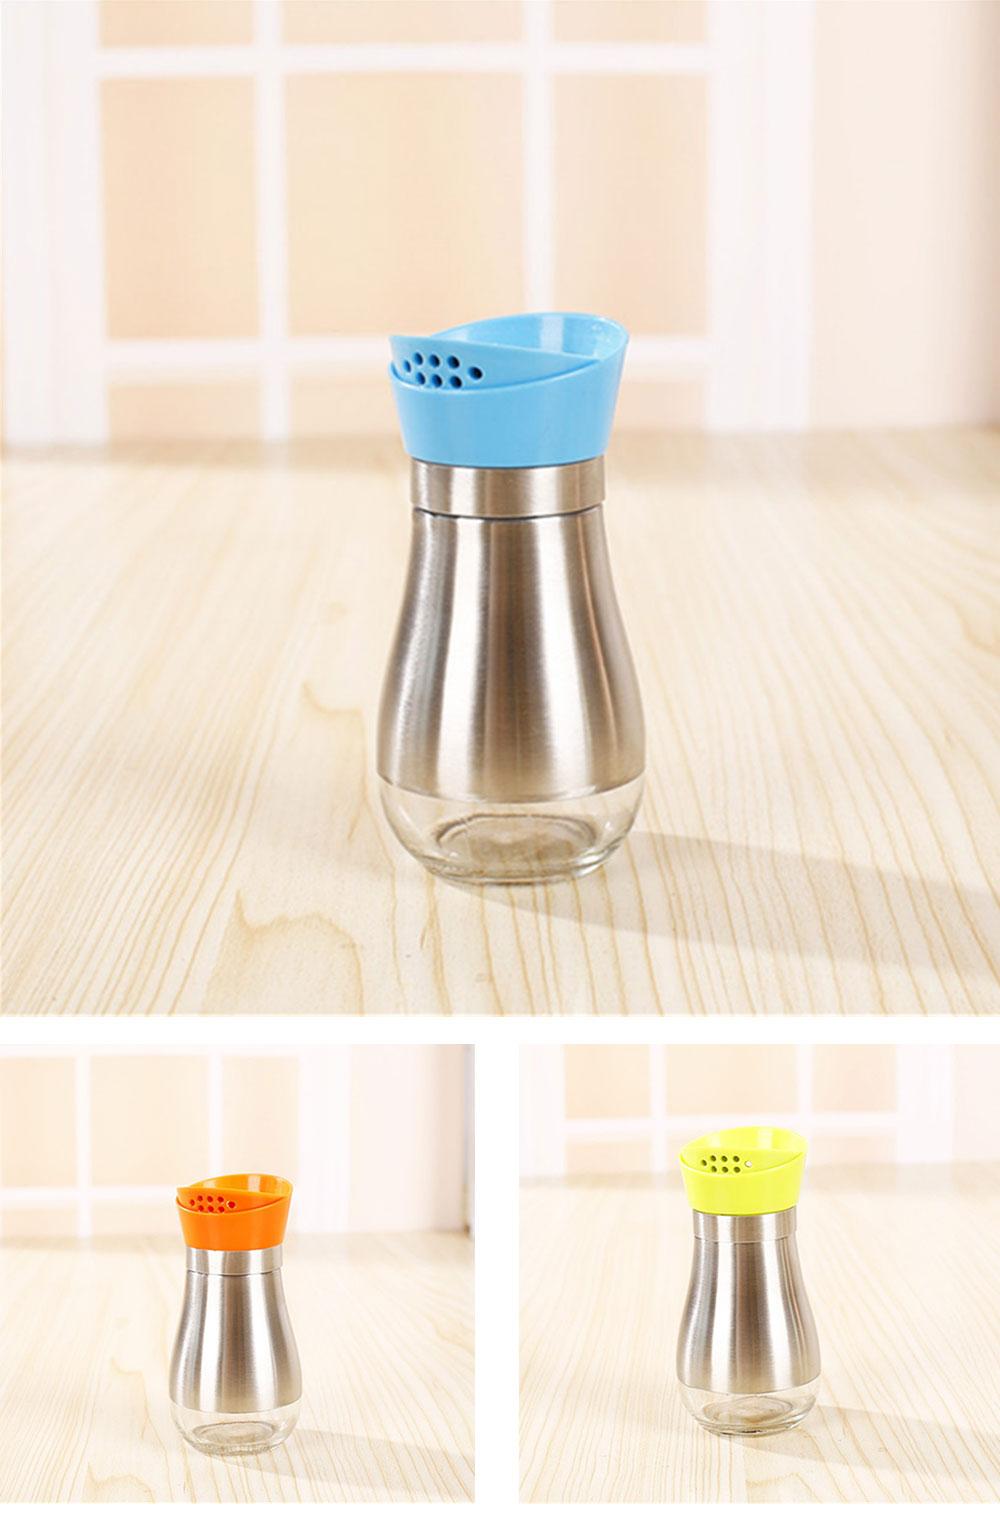 Stainless-steel Sauce Bottle for Putting Pepper, Salt, Chicken Essence, Double-Opening Seasoning Glass Bottle 6